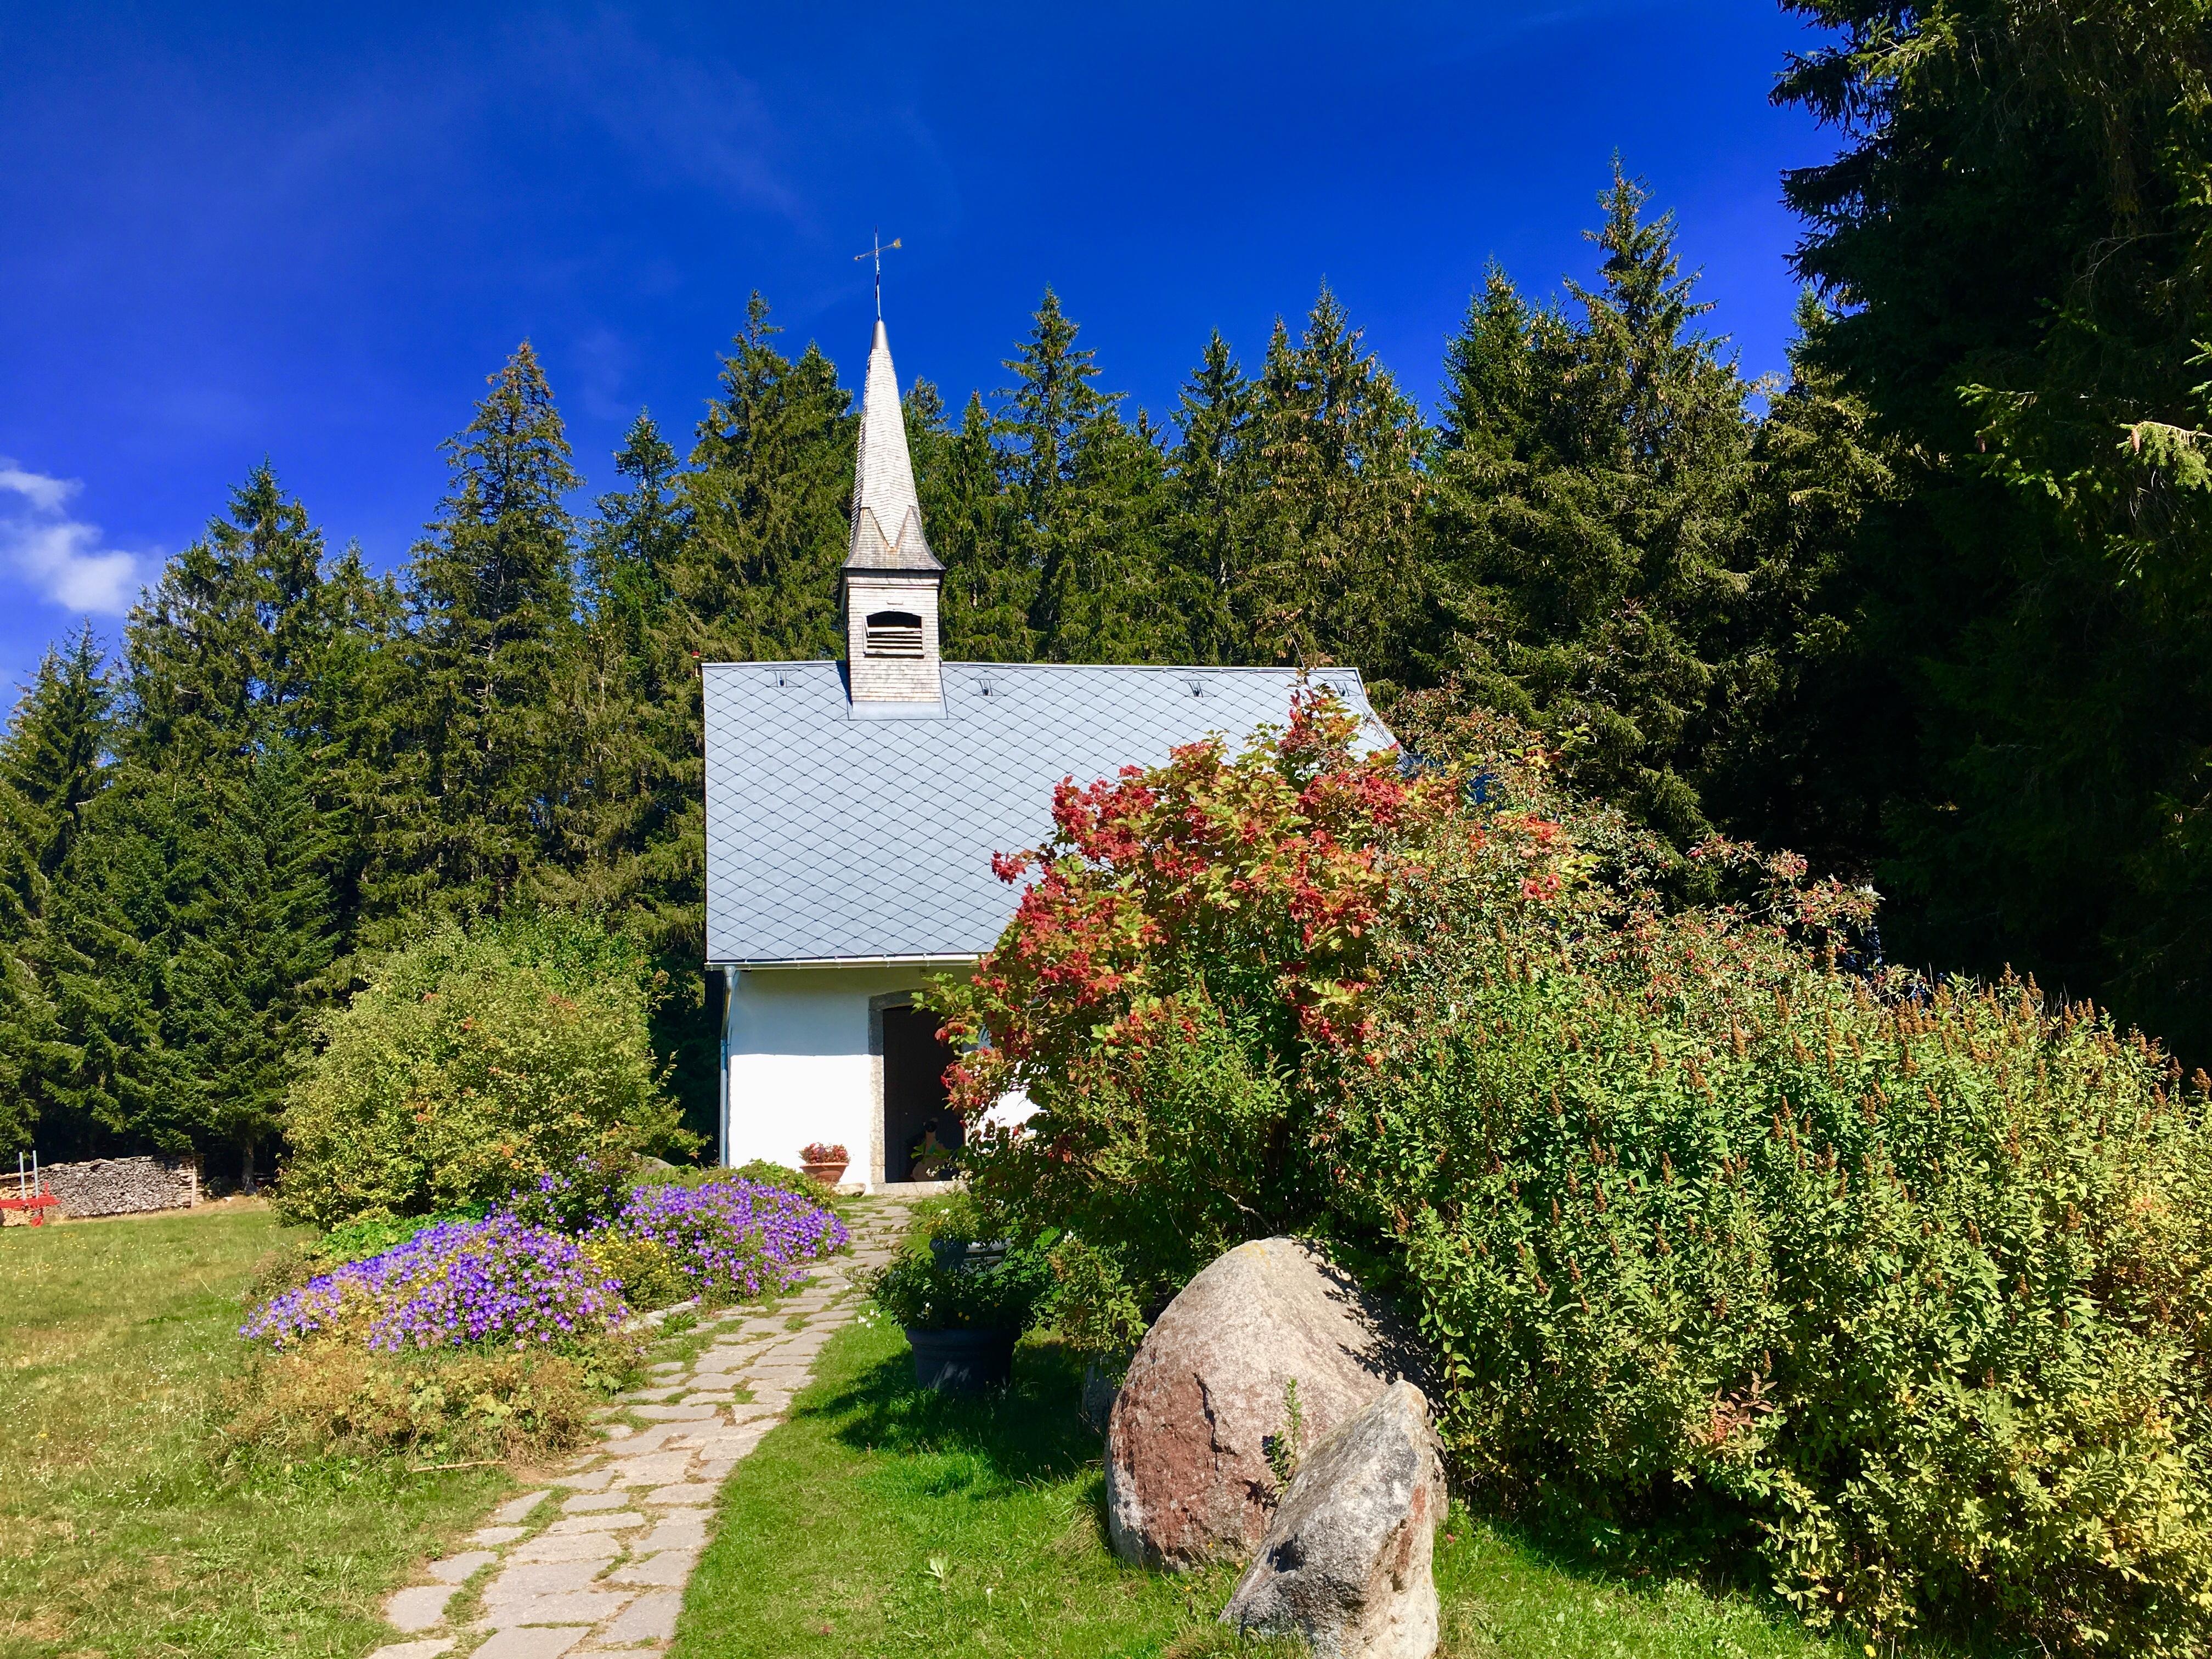 Todo HEIDI… Una visita al Kolmenhof en la hermosa Selva Negra (Schwarzwald), Mario Schumacher Blog